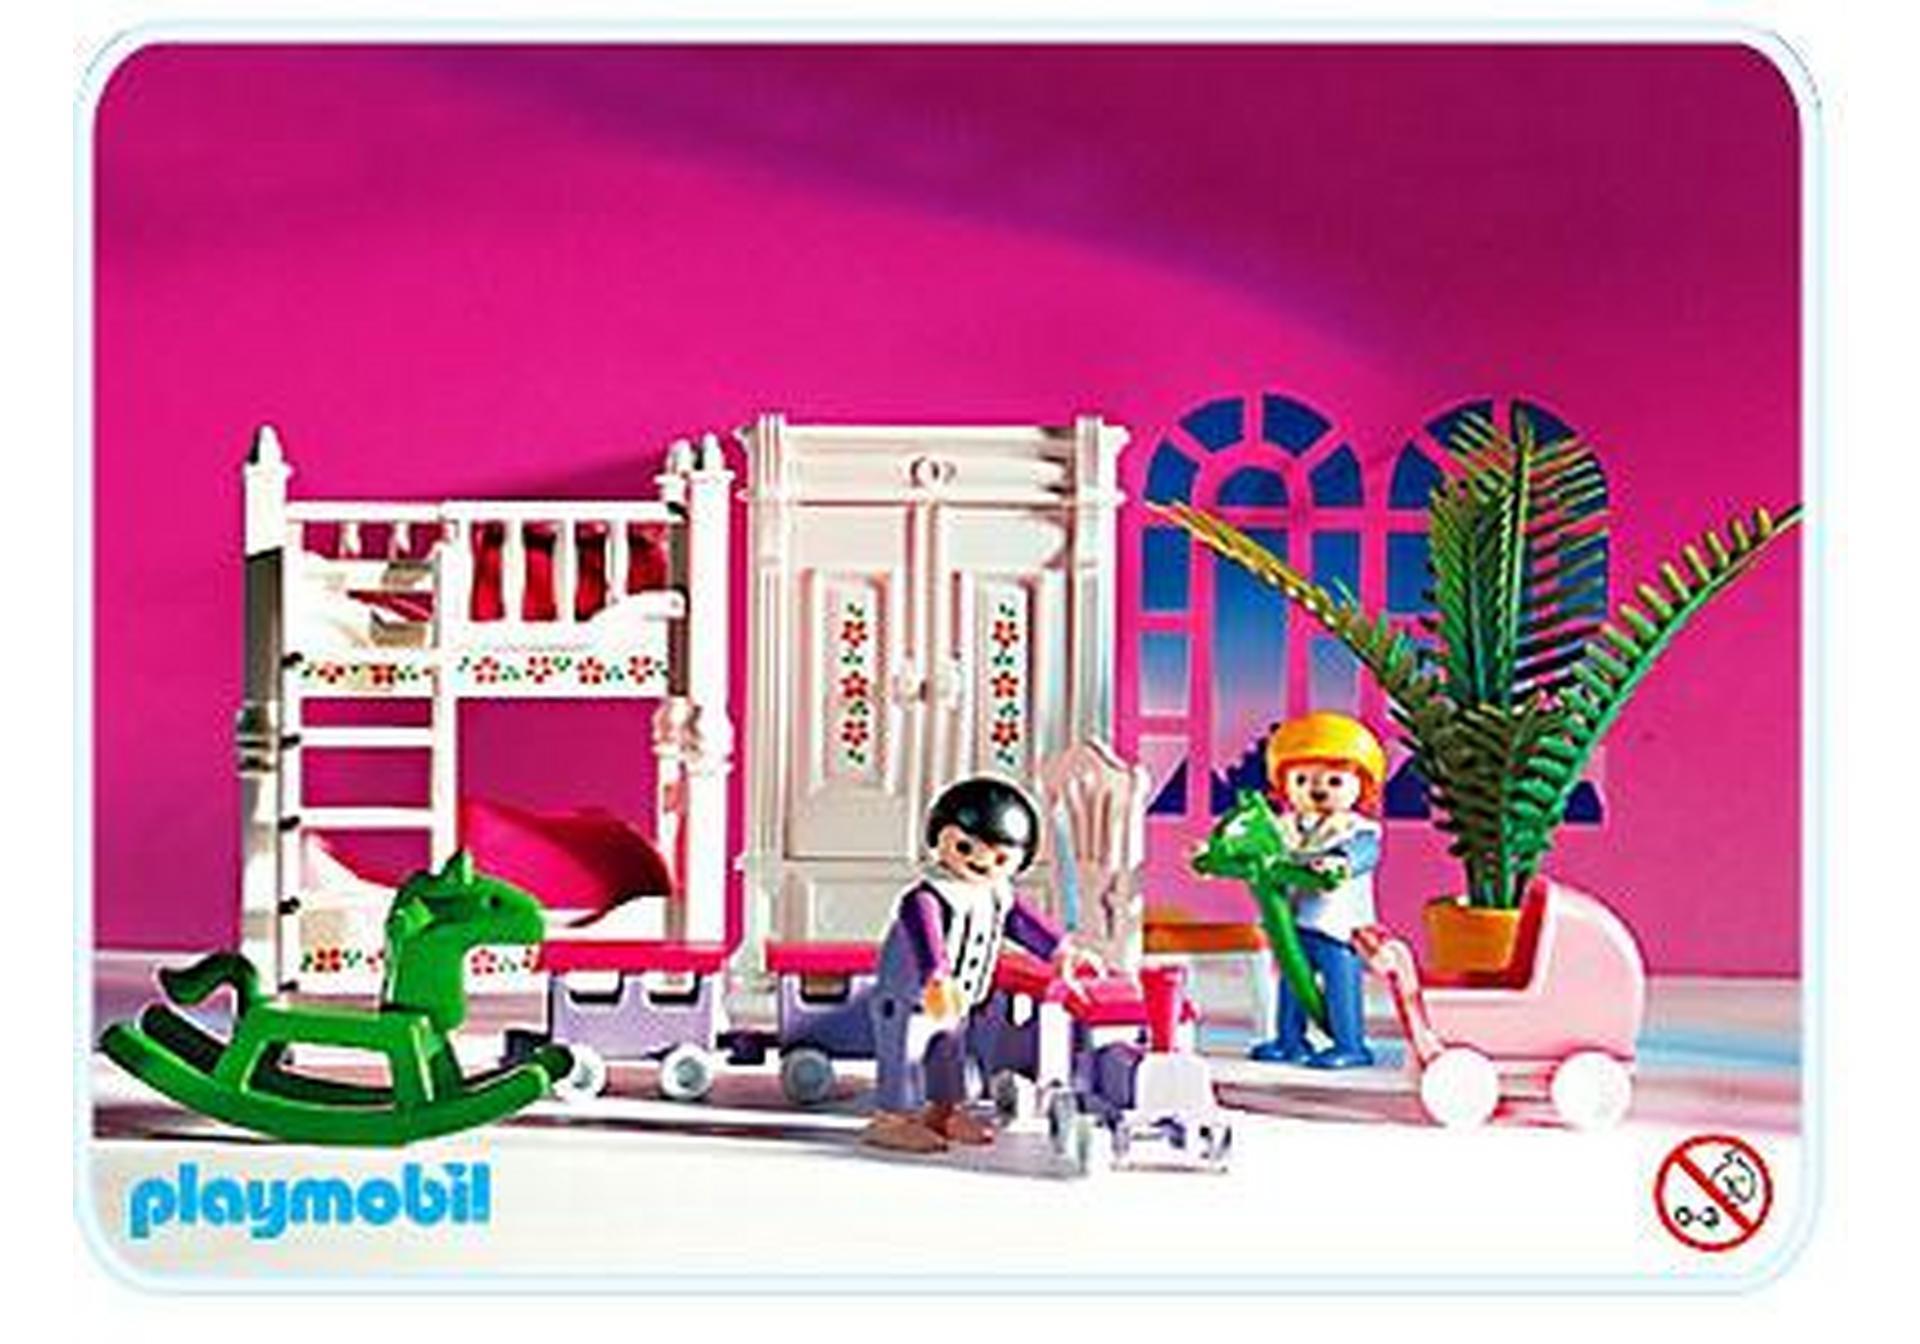 Chambre des enfants 5312 a playmobil france for Playmobil chambre enfant